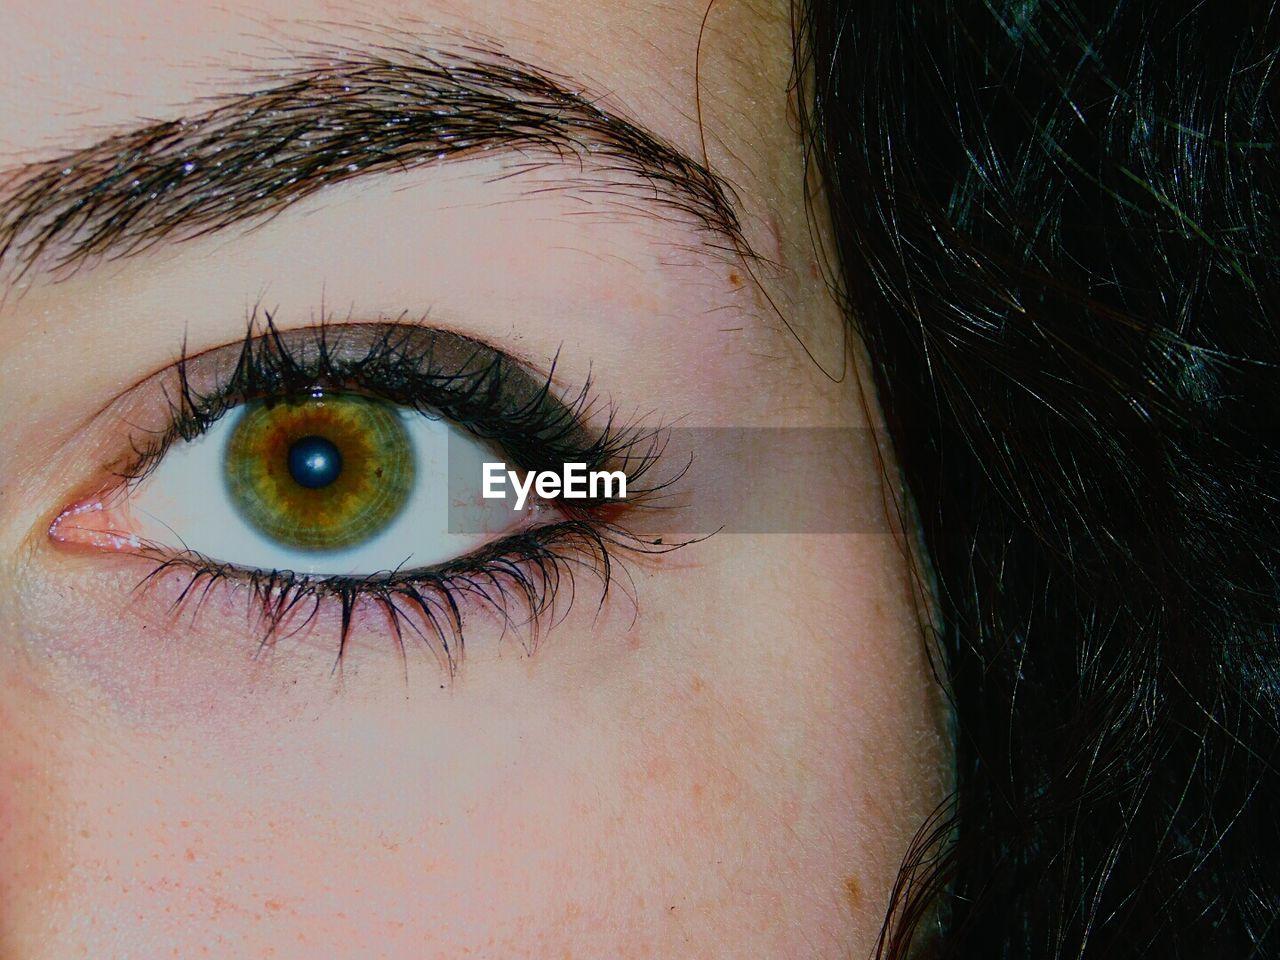 human eye, human body part, eyelash, eyeball, eyesight, one person, human skin, close-up, real people, eyebrow, iris - eye, sensory perception, looking at camera, portrait, outdoors, day, people